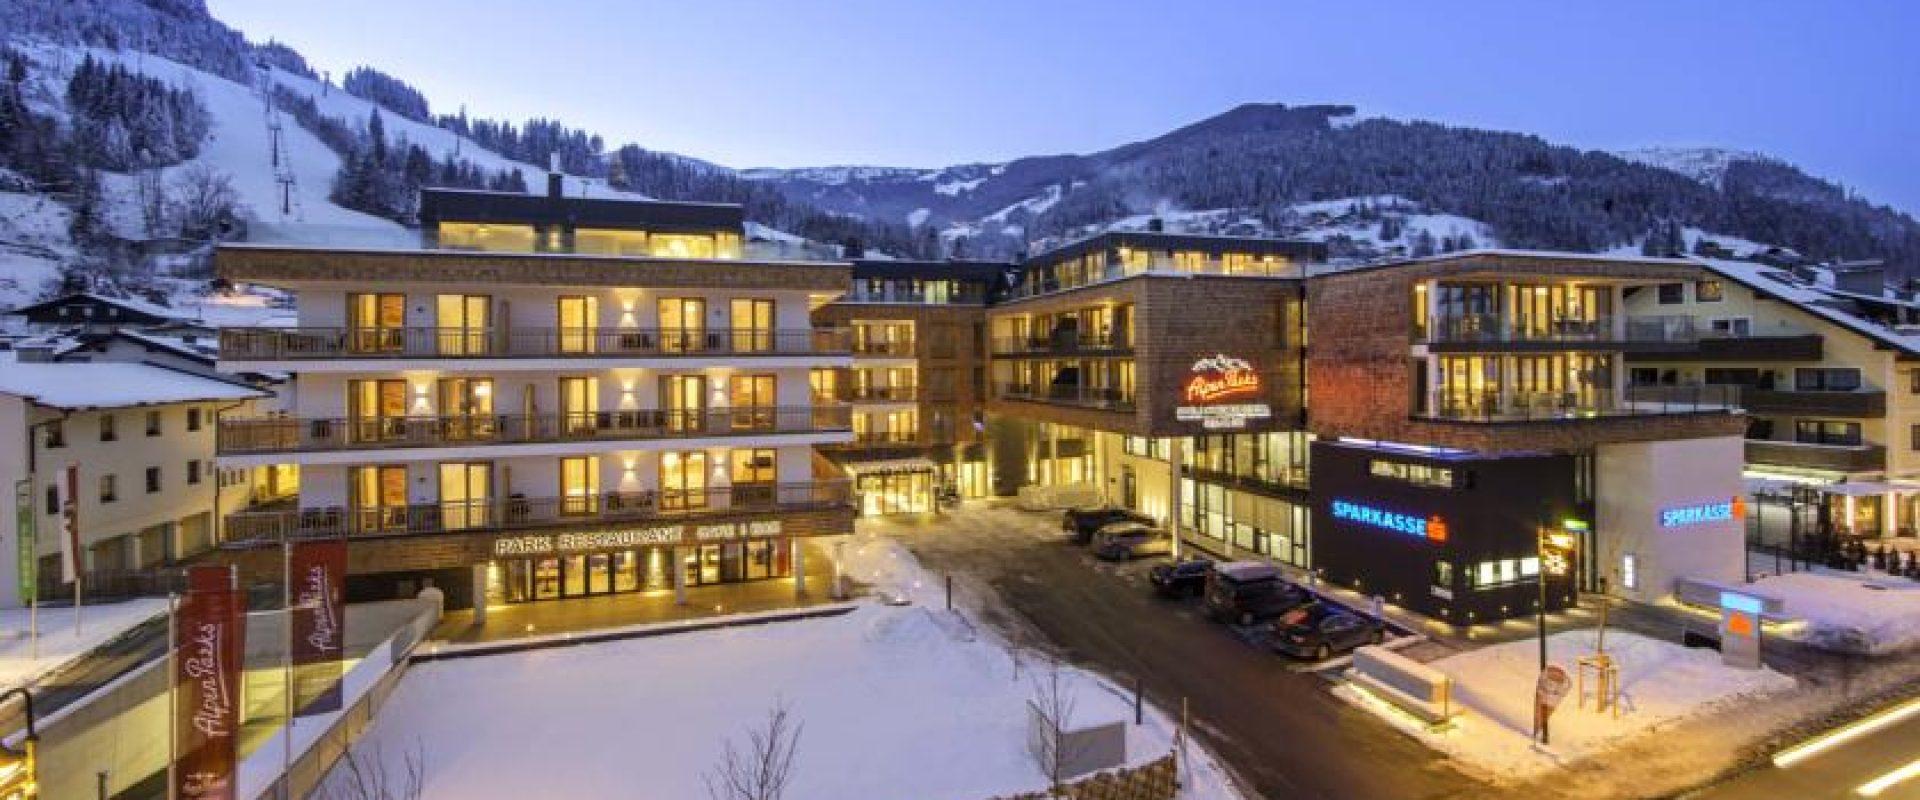 Munte Austria, Kaprun, AlpenParks Hotel & Apartment Central